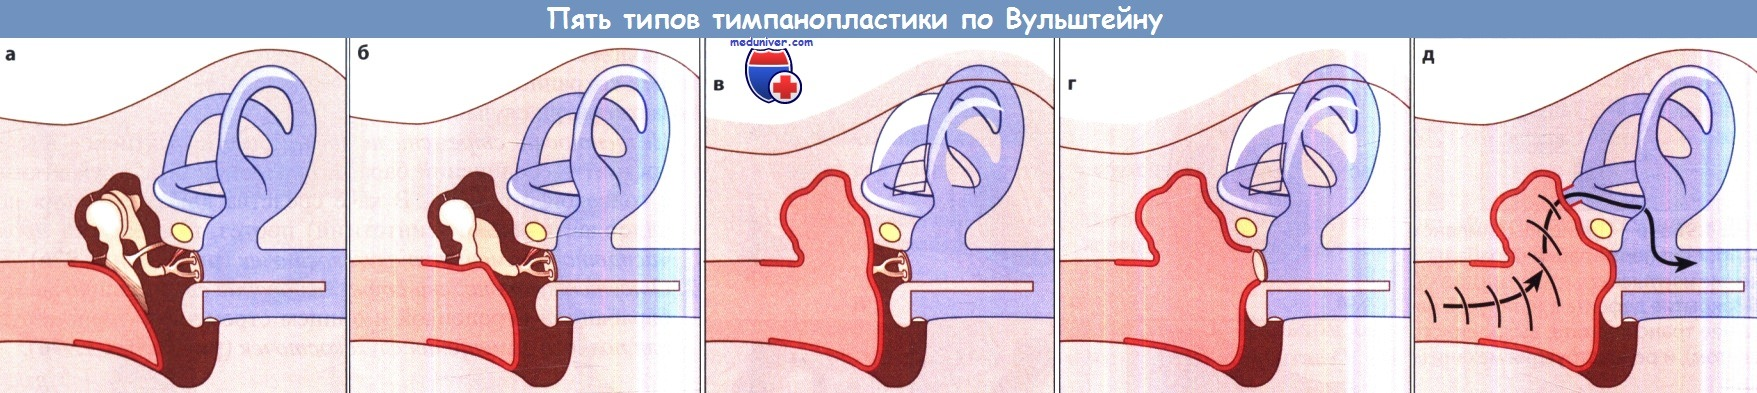 Пять типов тимпанопластики по Вульштейну